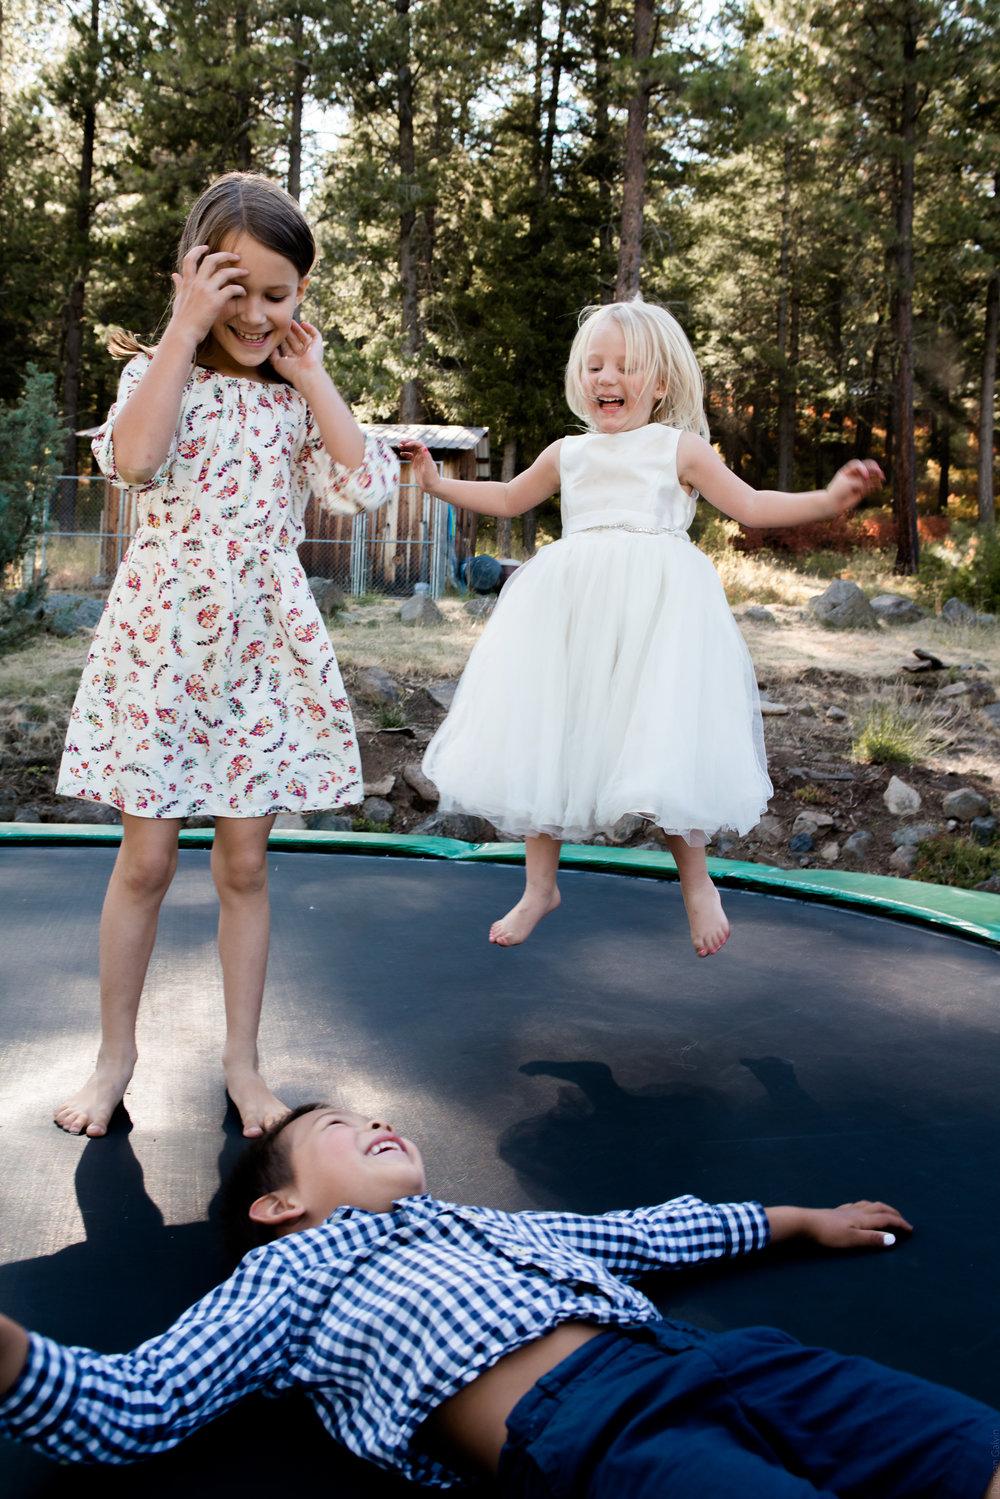 Lana Micah Wedding La Grande Oregon September 2018 Please Credit Talia Jean Galvin (256 of 687).jpg